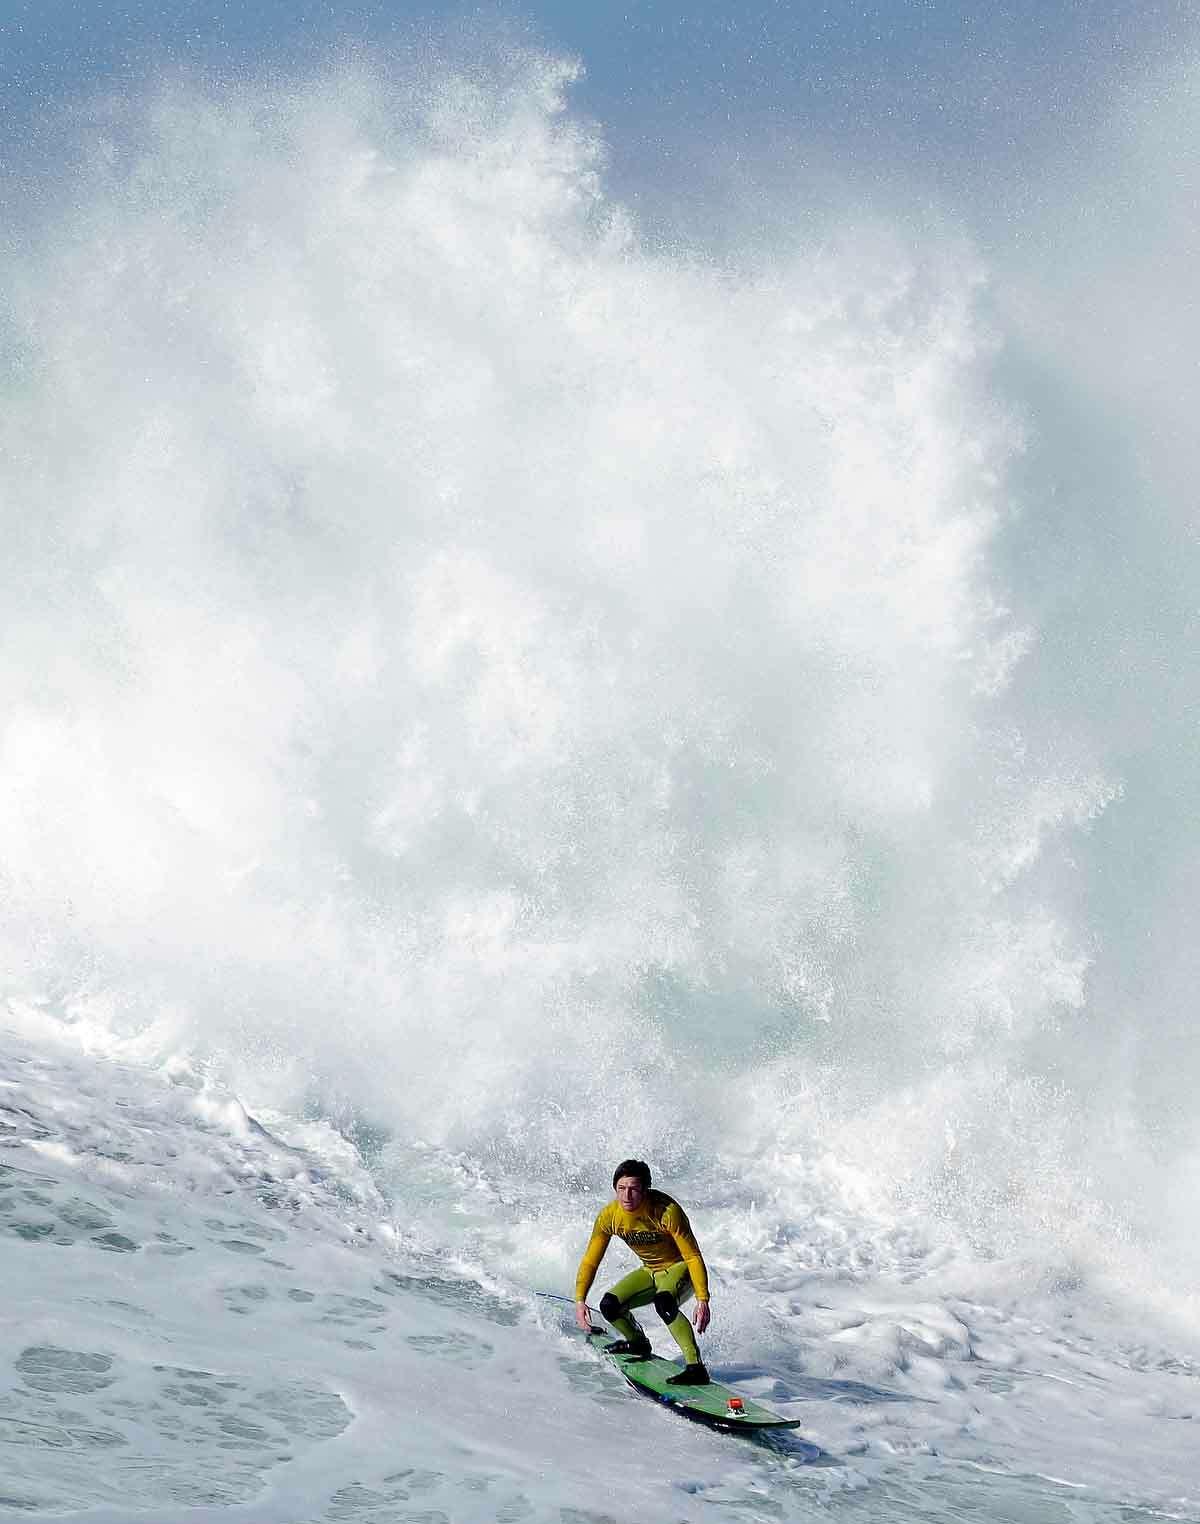 Colin Dwyer competes during heat 4 of the Mavericks Invitational big wave surf contest in Half Moon Bay, Calif., Sunday, Jan. 20, 2013. (AP Photo/Marcio Jose Sanchez)